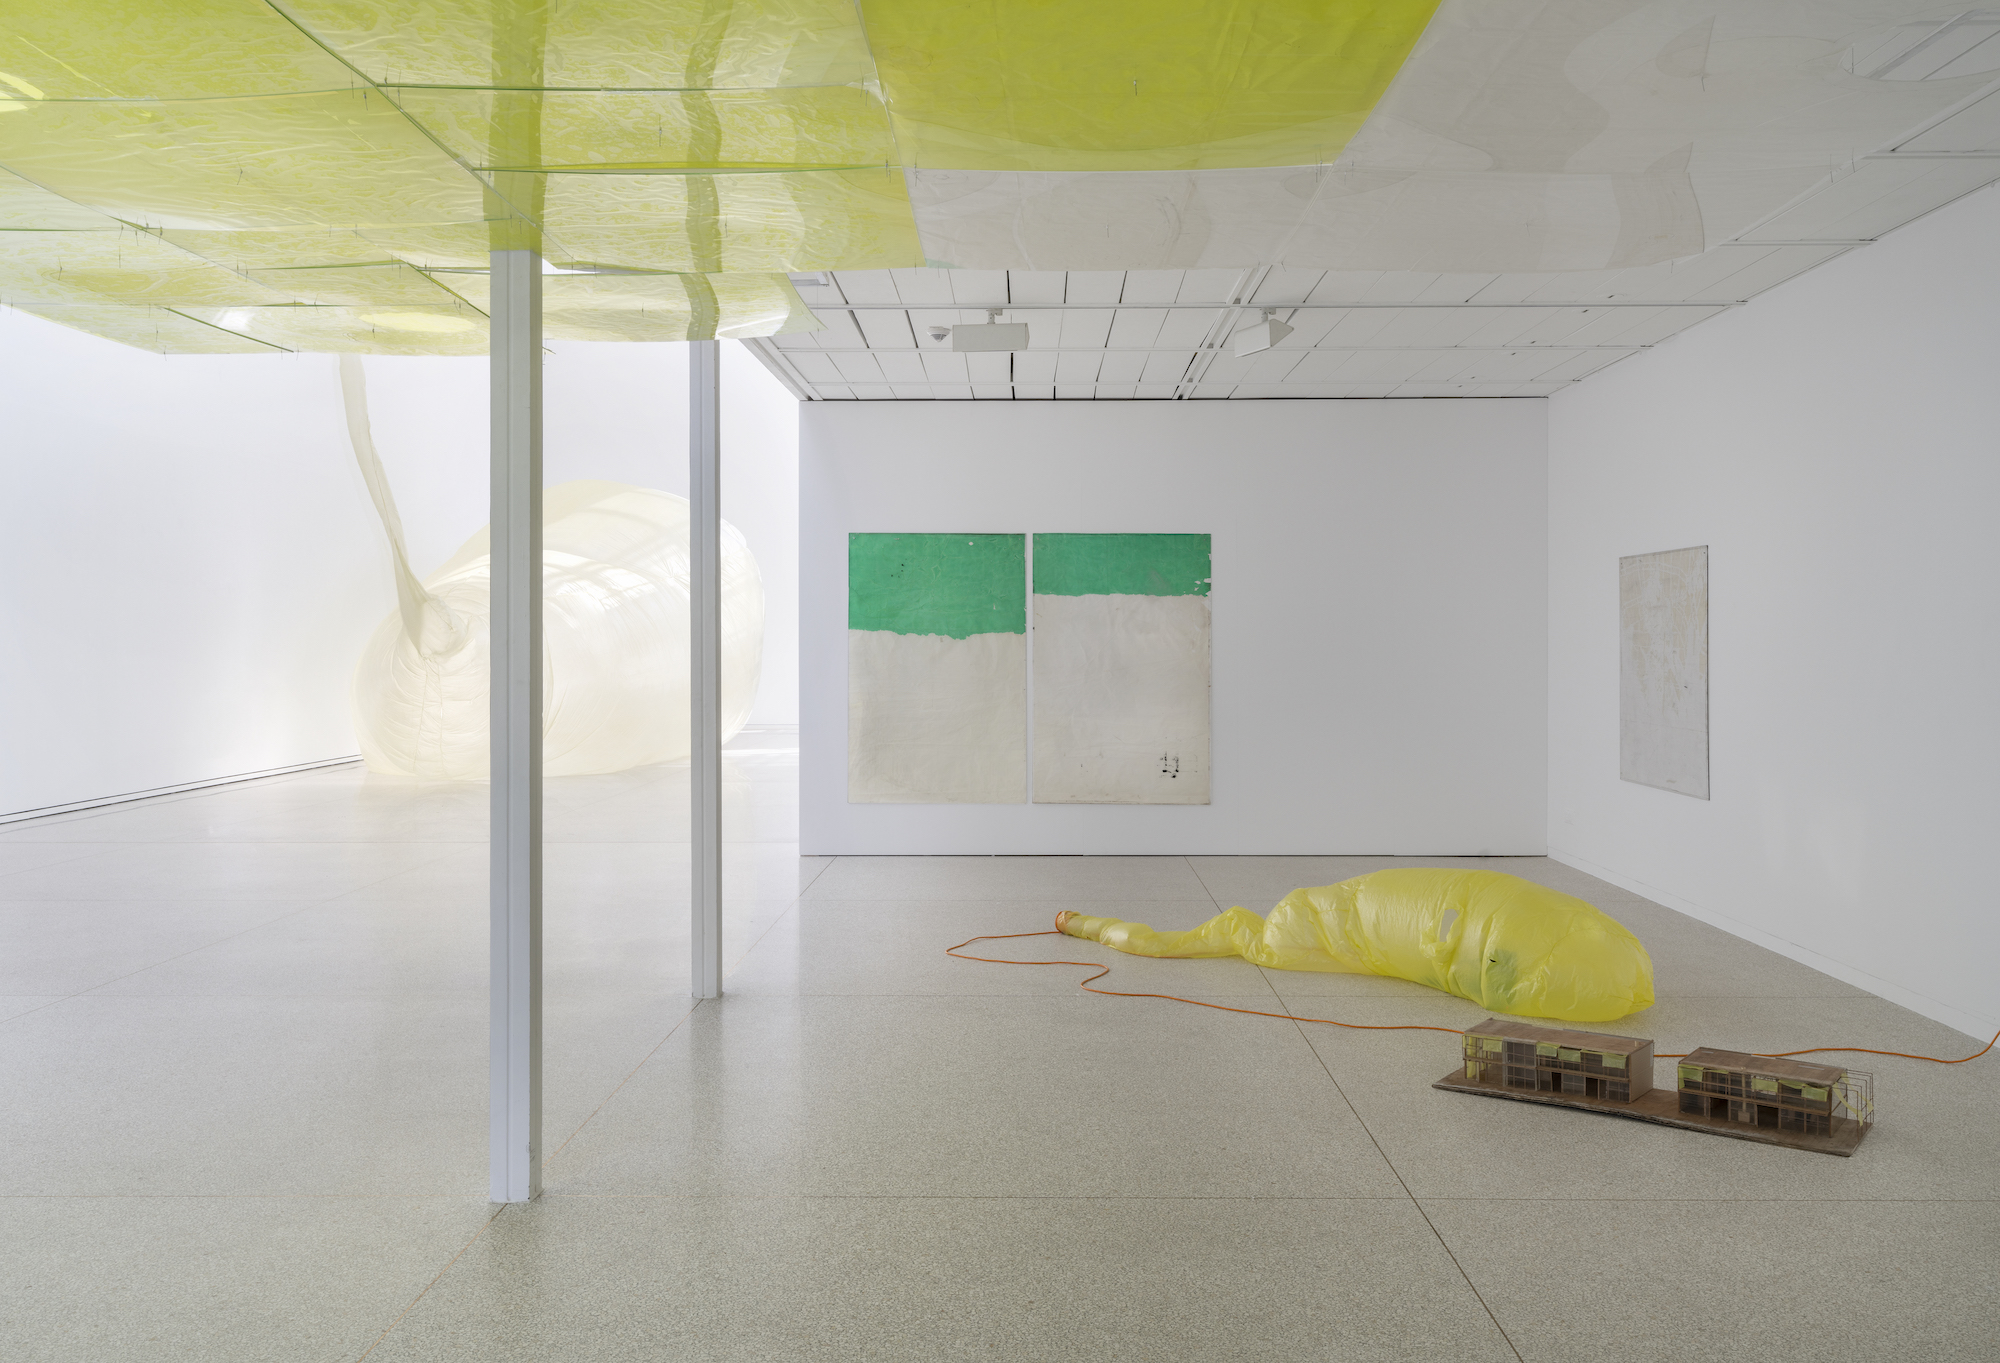 Ian Kiaer, Endnote, tooth (green), 2017, endnote (ping), 2020, Installation View, Heidelberger Kunstverein, 2020 © Heidelberger Kunstverein / Wolfgang Günzel